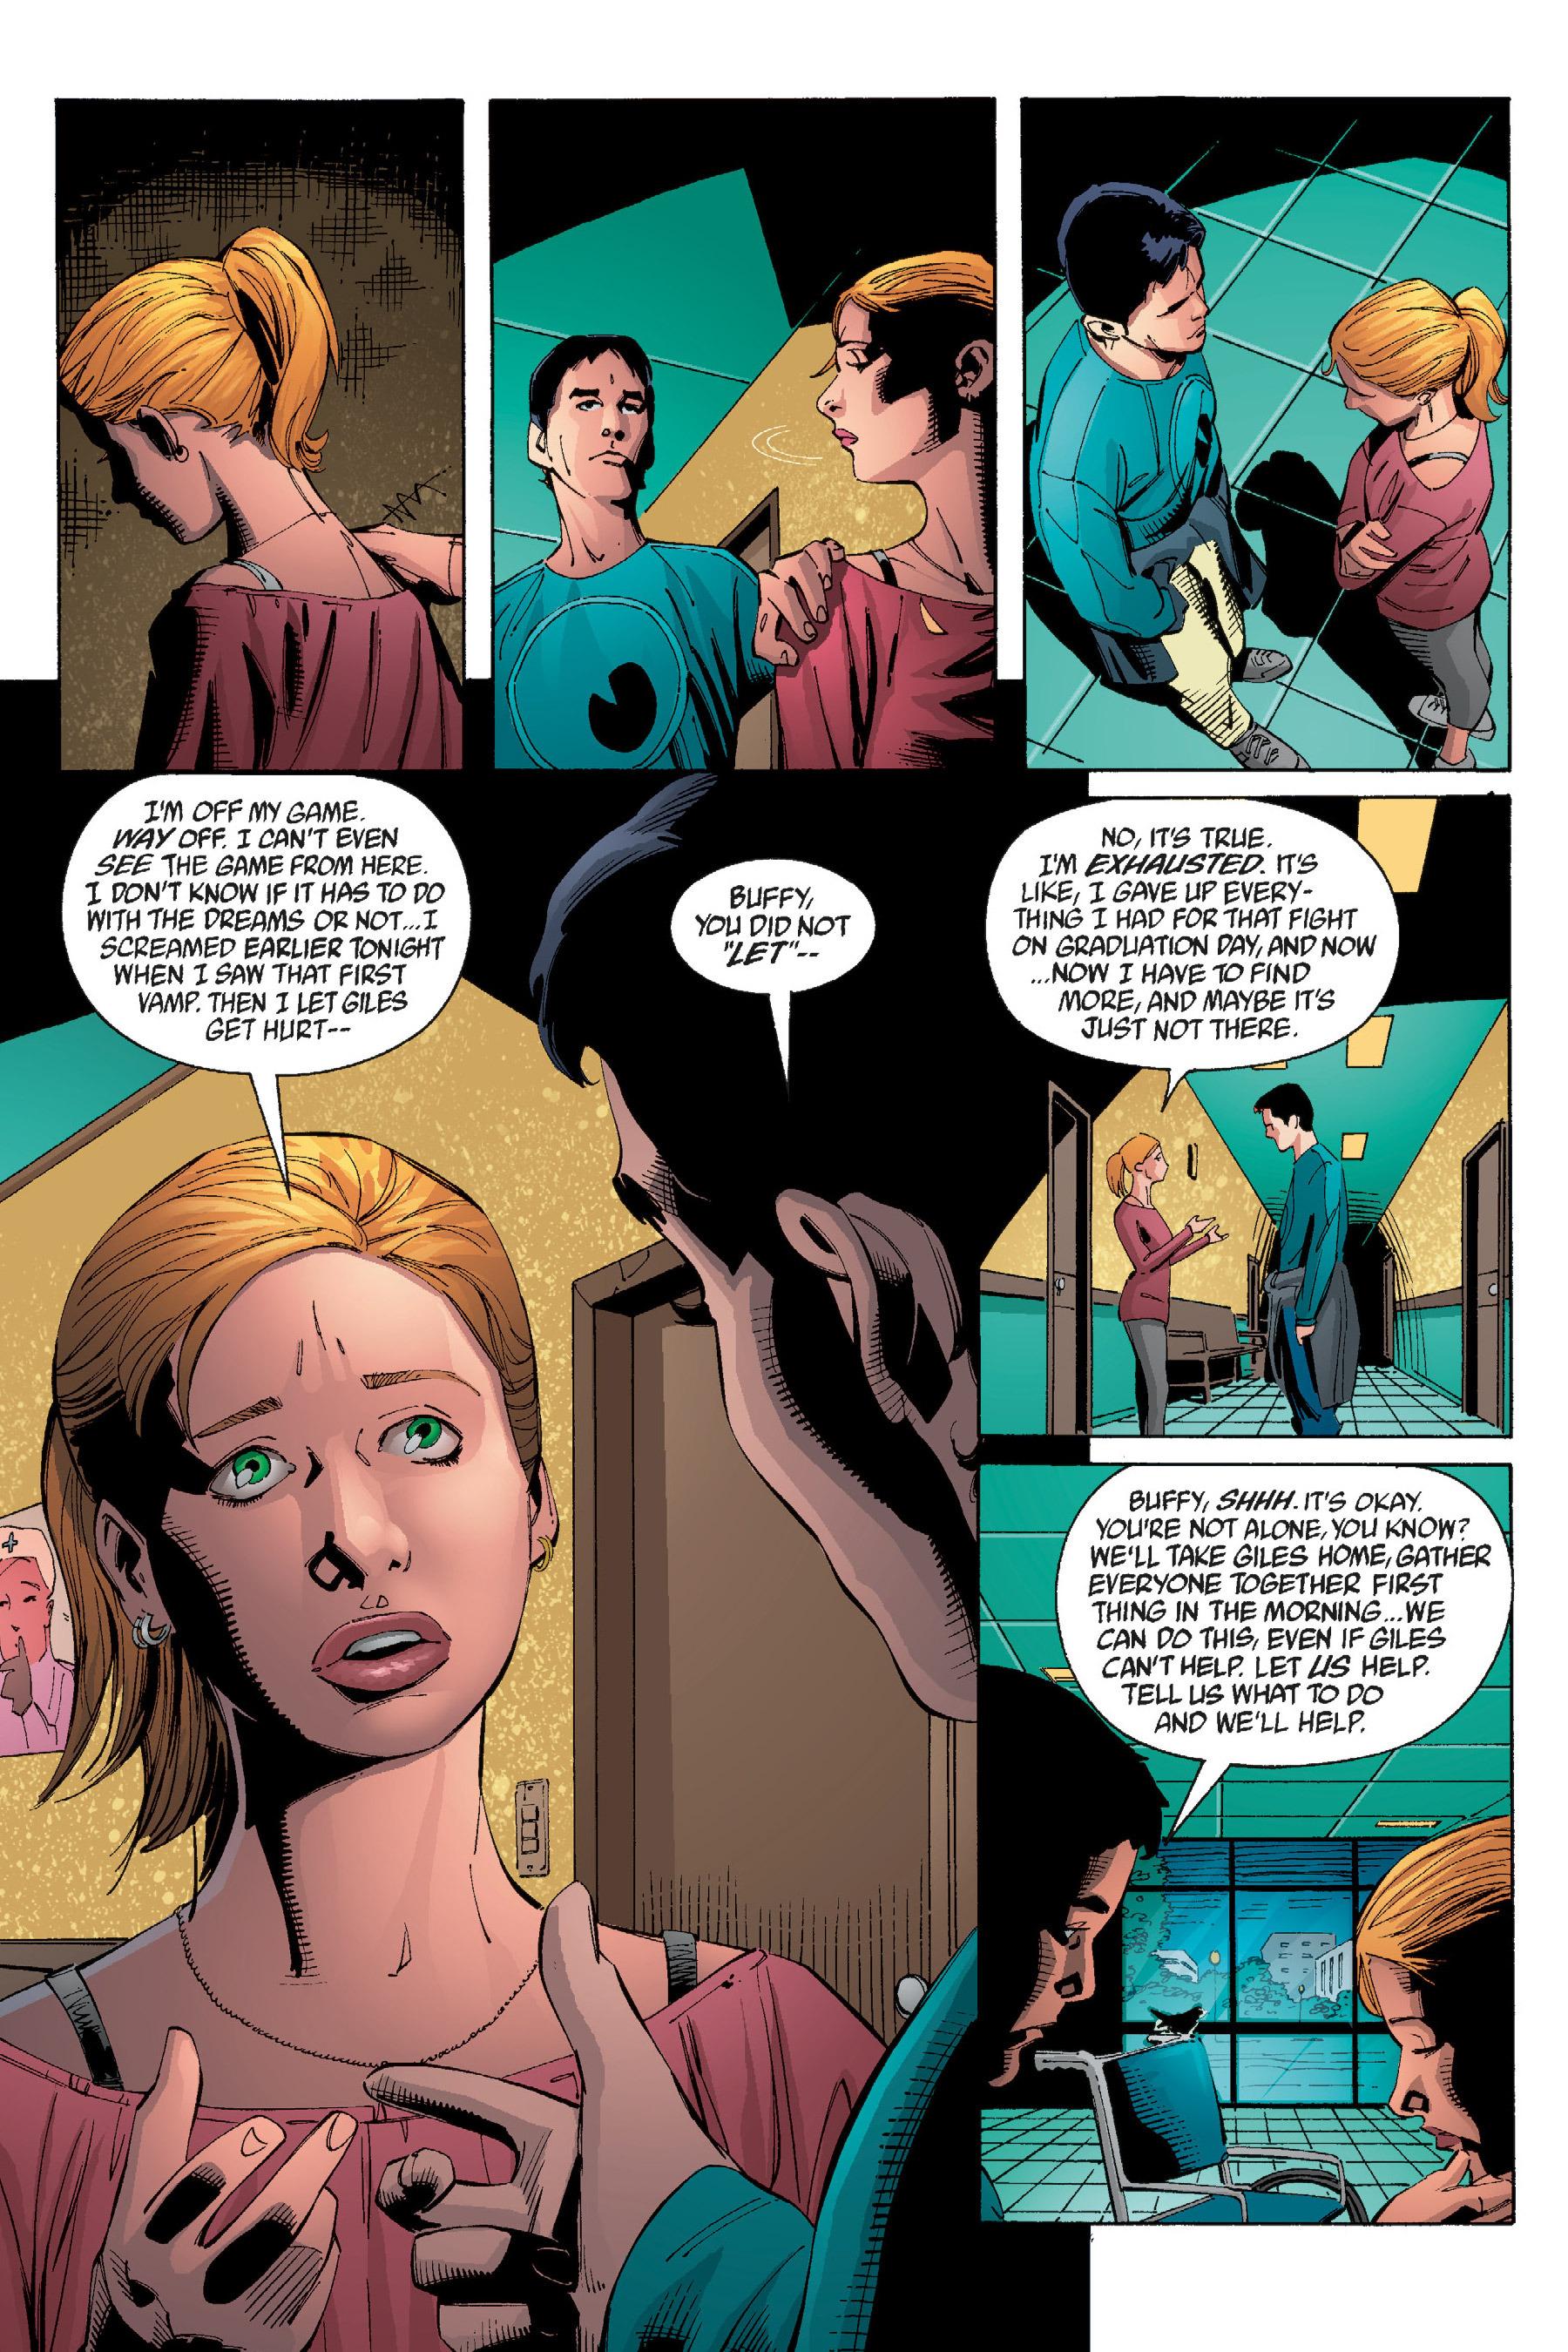 Read online Buffy the Vampire Slayer: Omnibus comic -  Issue # TPB 5 - 39